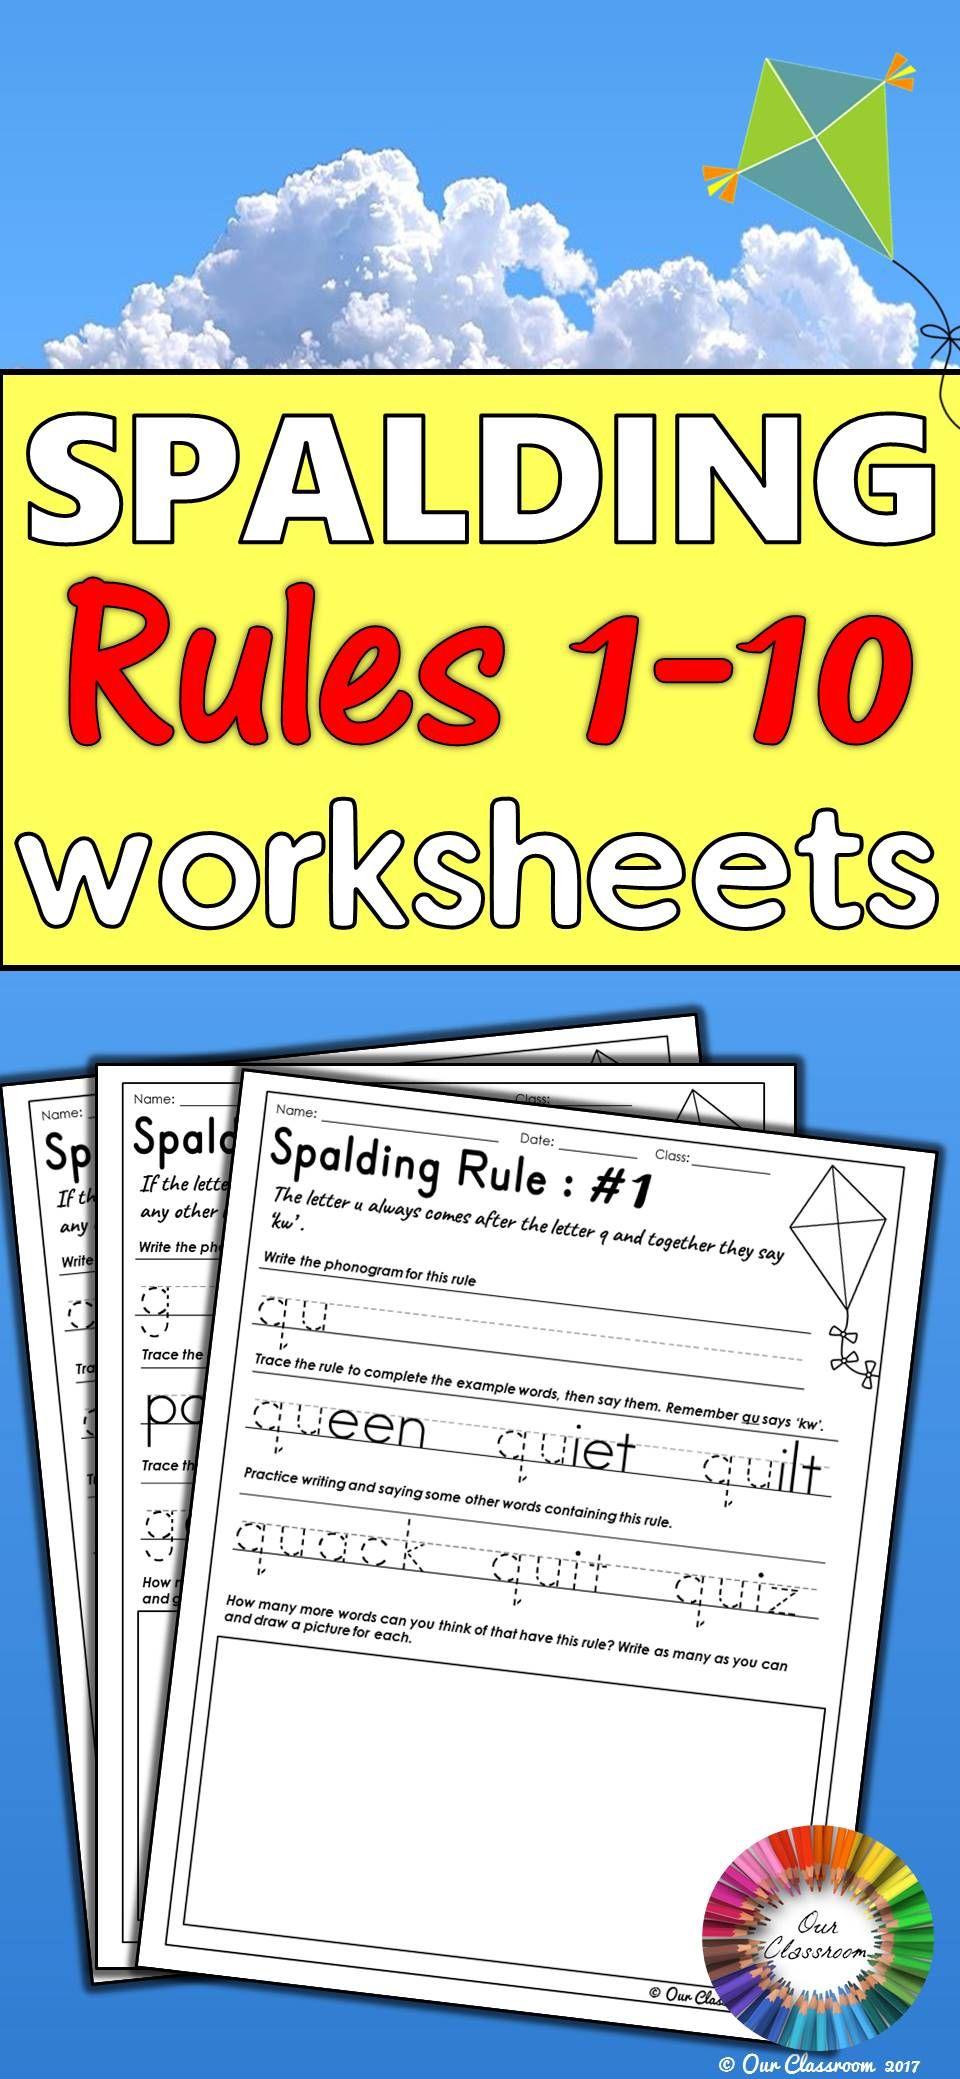 Spalding Rules 1 10 Worksheets Fantastic Firsties Pinterest